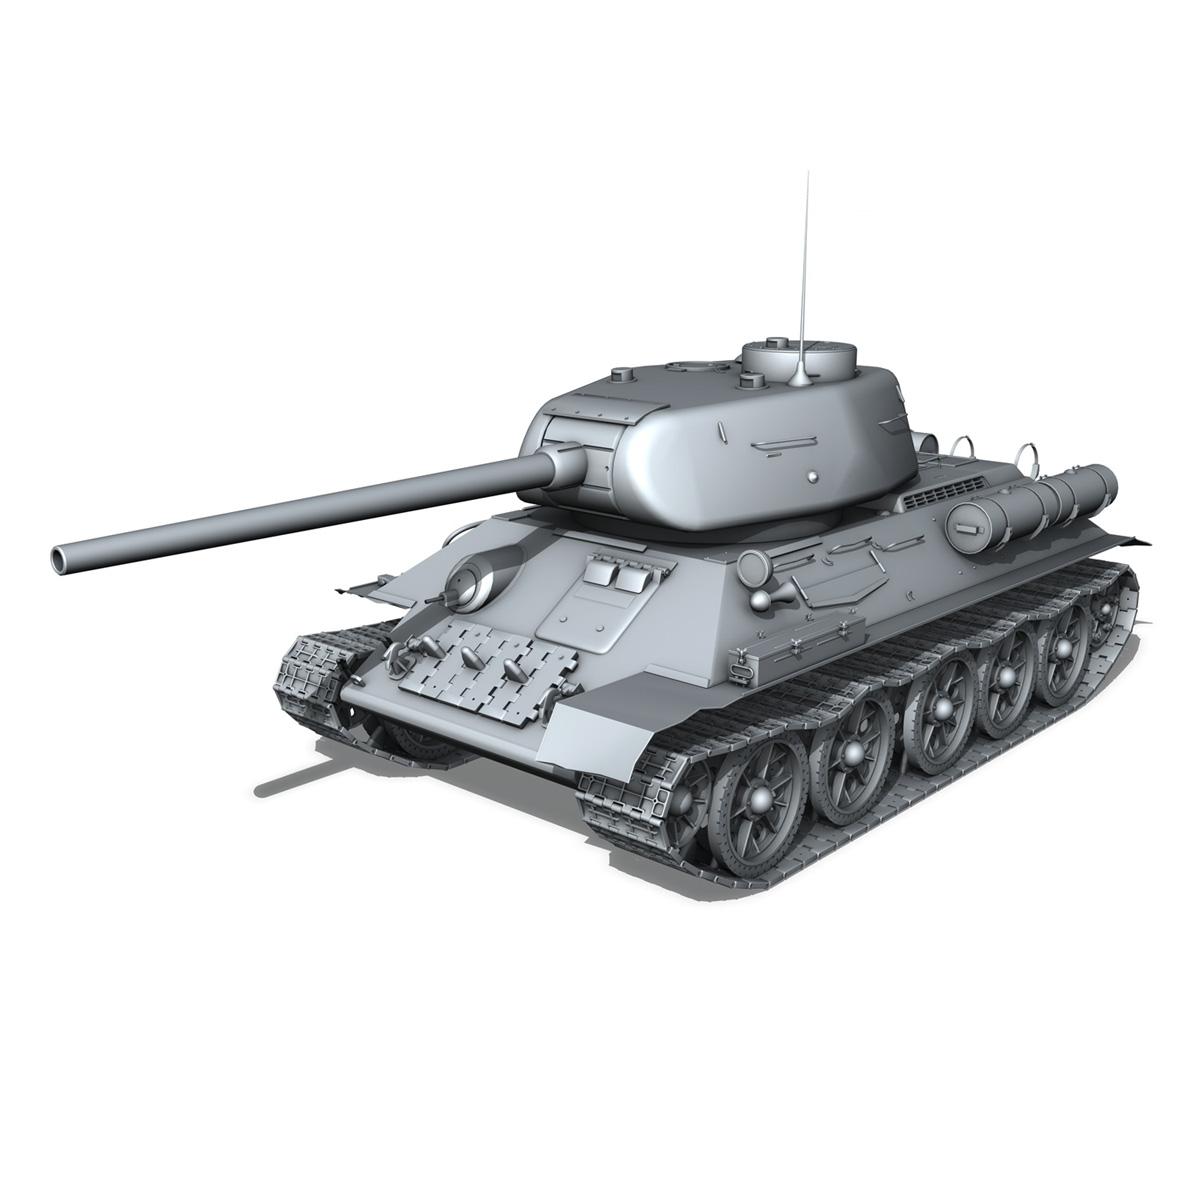 t-34 85 – soviet medium tank 3d model 3ds fbx lwo lw lws obj c4d 266409